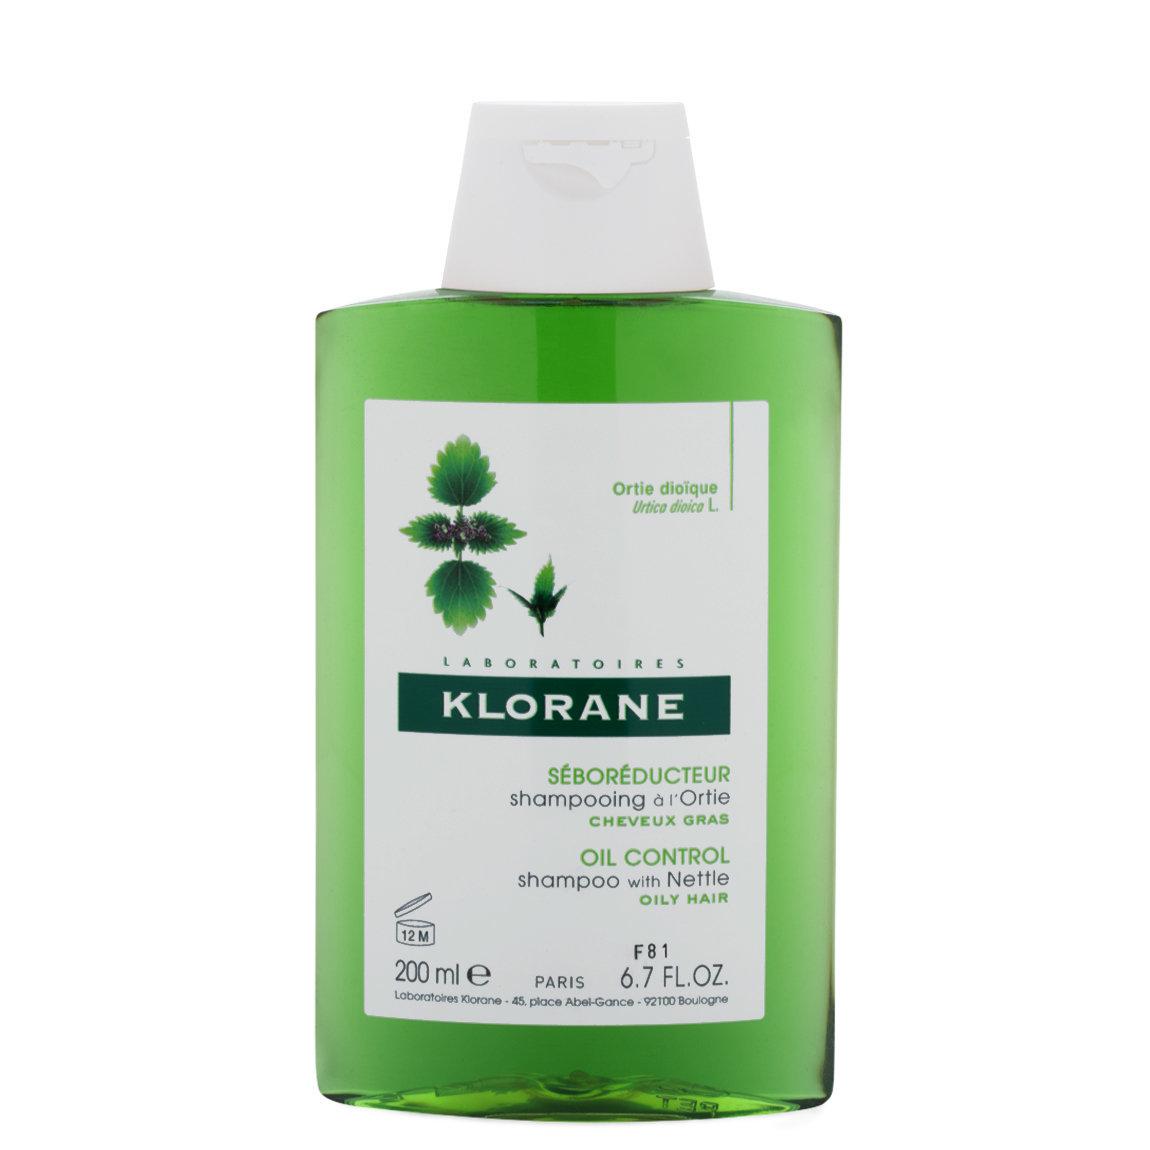 Klorane Shampoo with Nettle 6.7 oz alternative view 1 - product swatch.